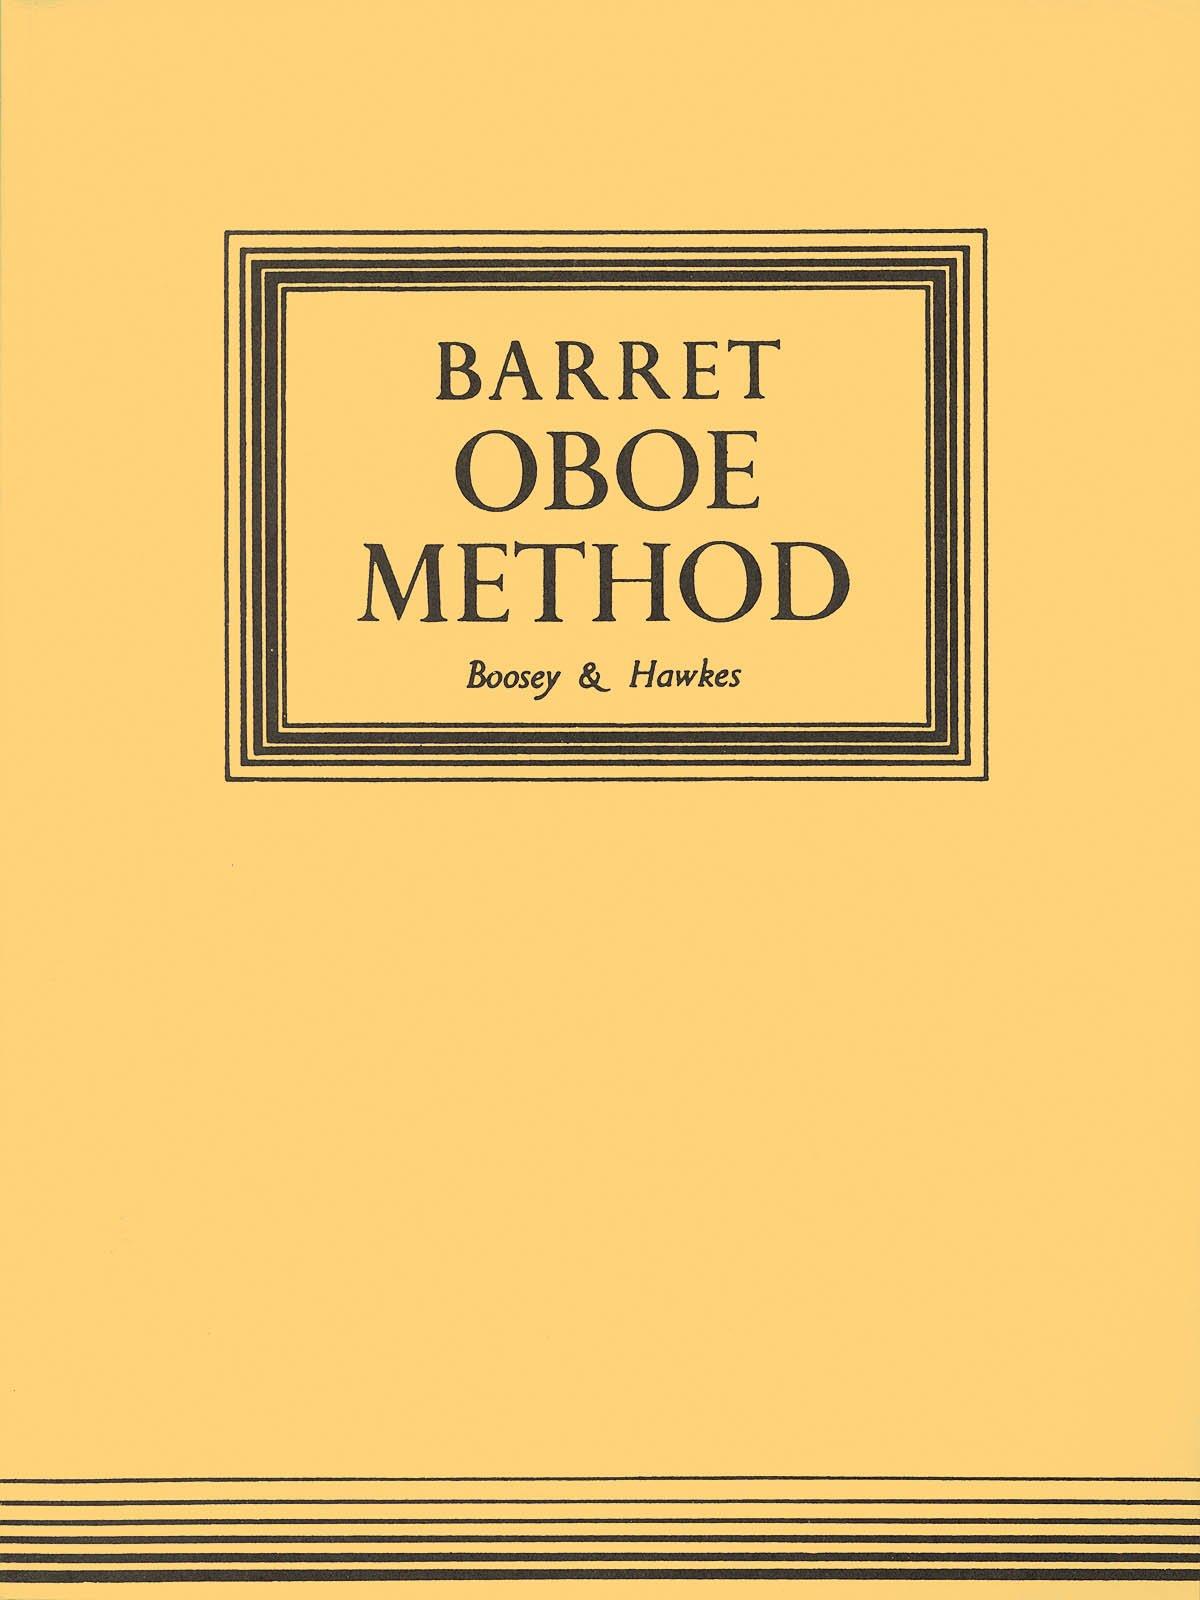 Oboe Method by Barret